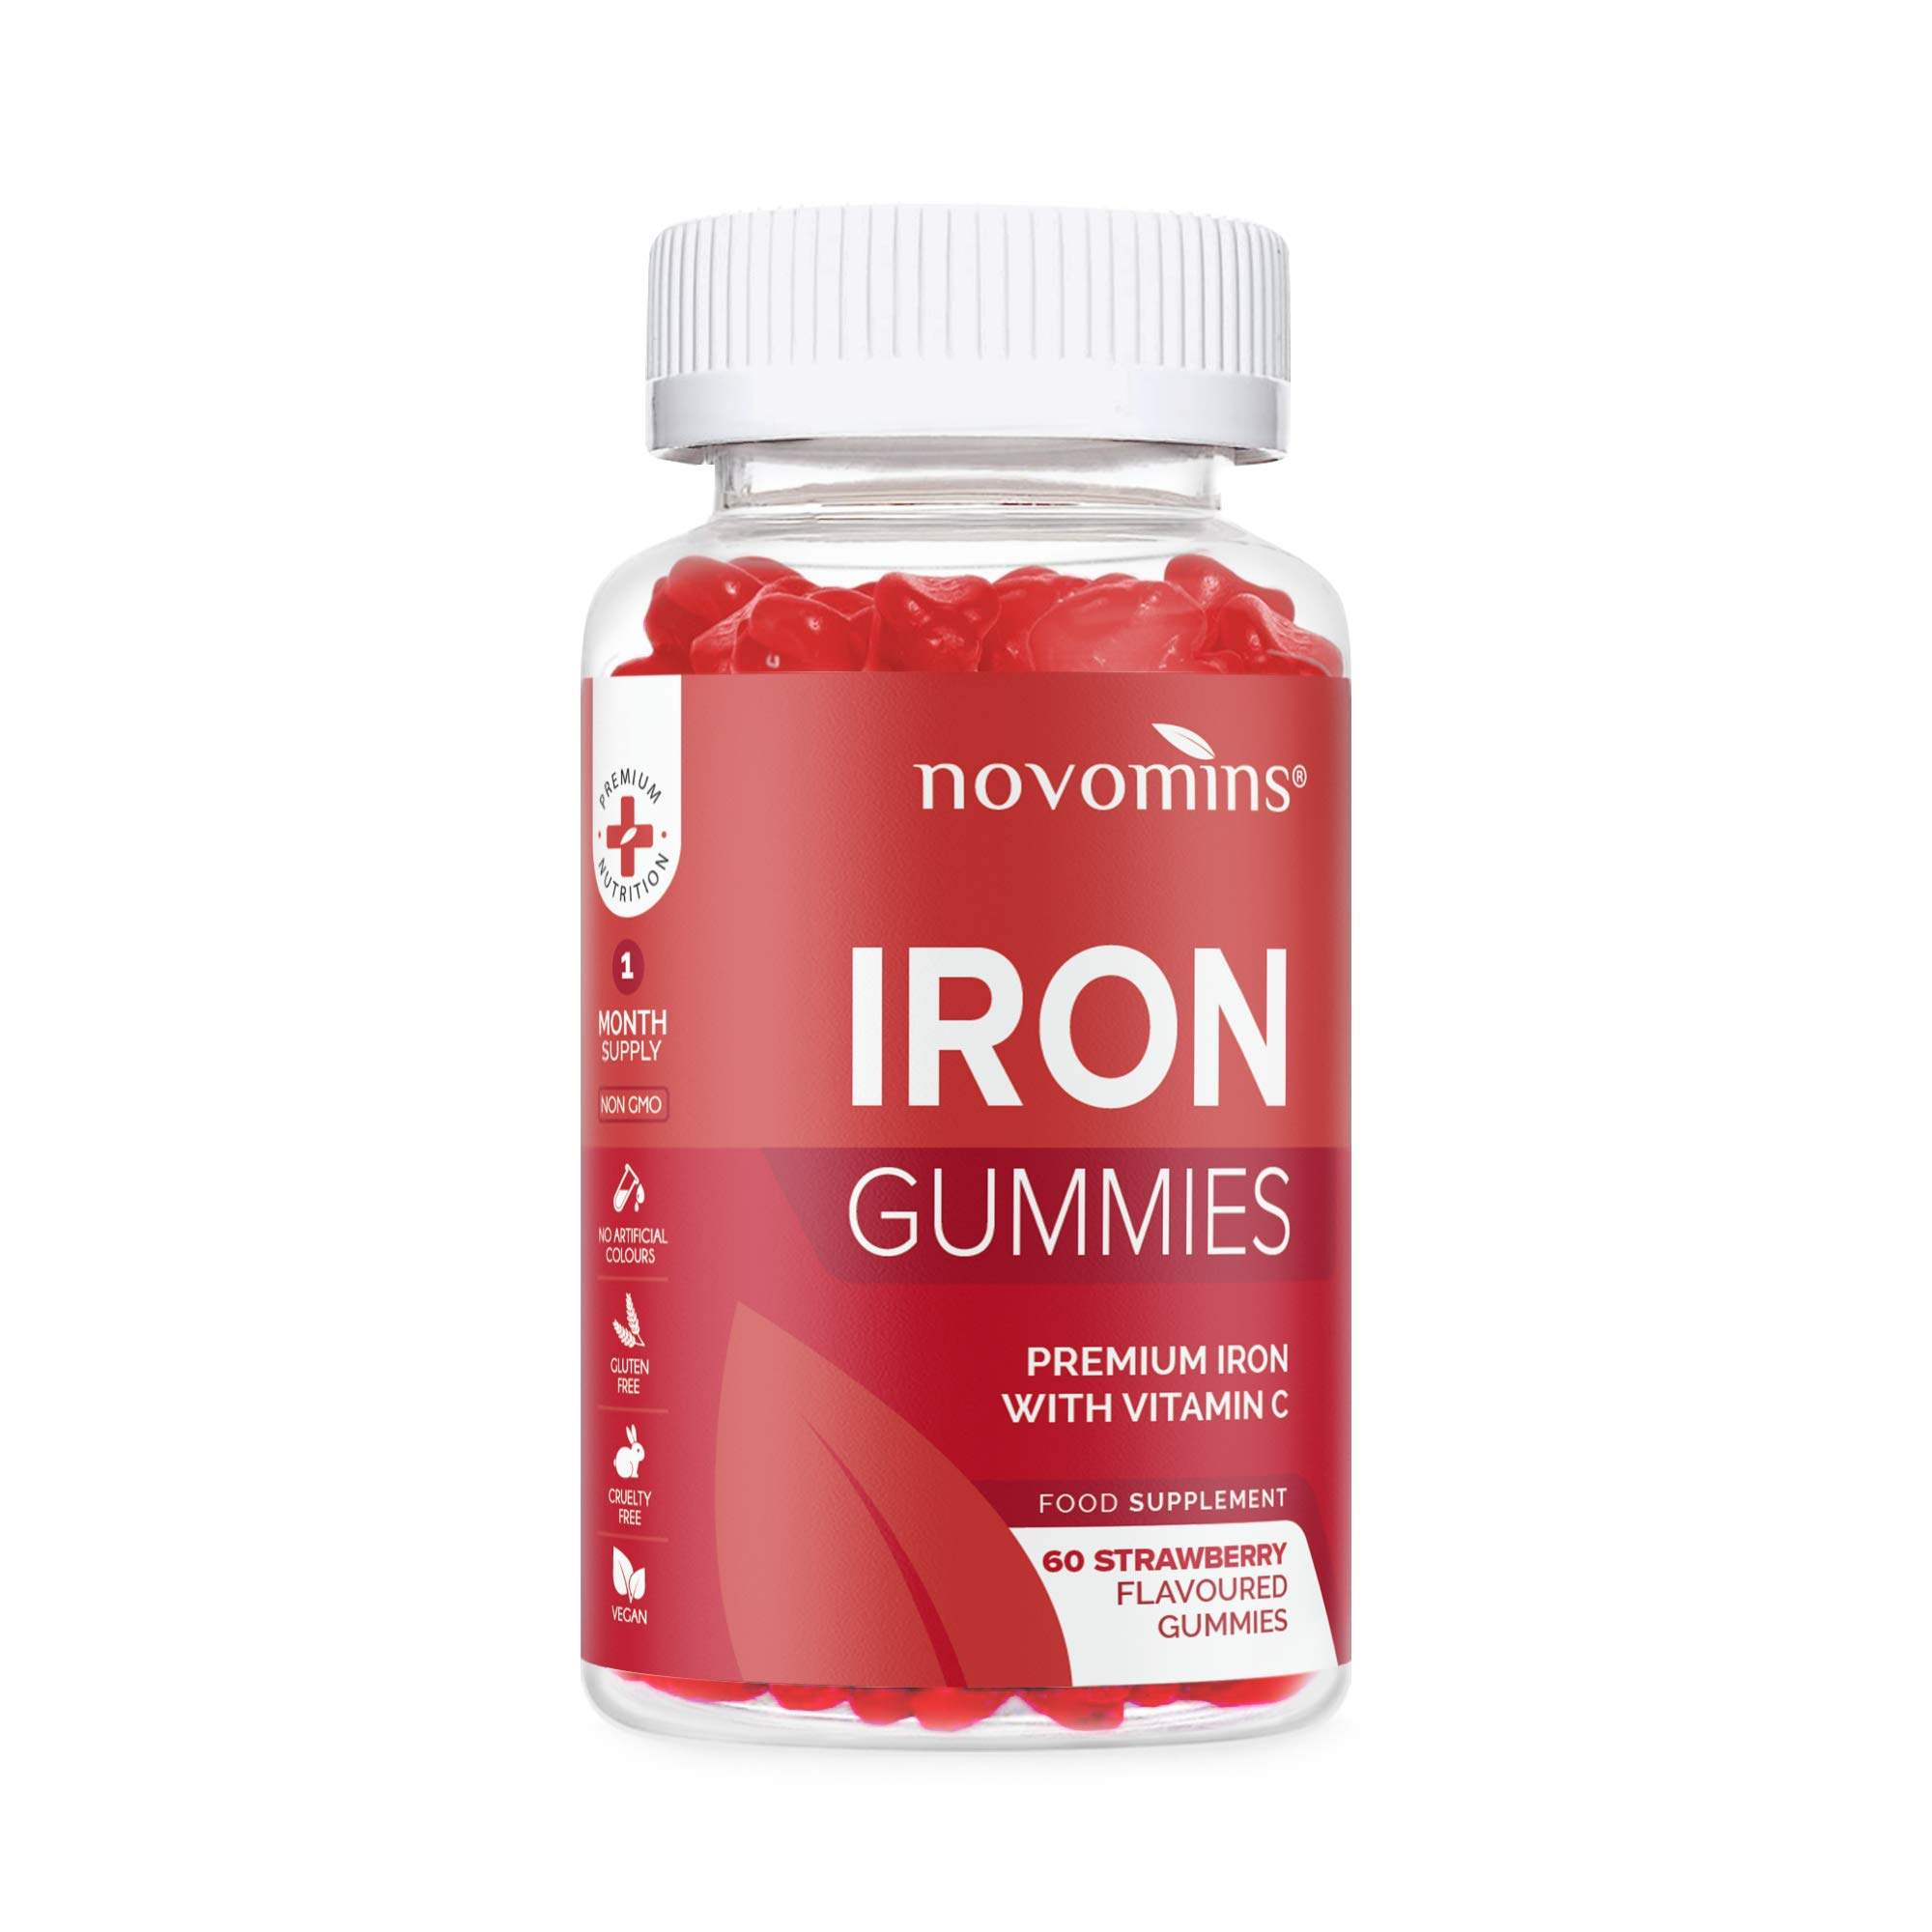 Vitamin C - Iron Gummies - Vitamin C Gummies - Chewable Vitamin C - High Strength Strawberry Flavoured Supplement - Vitamin C Nutrition - Made in UK by Novomins